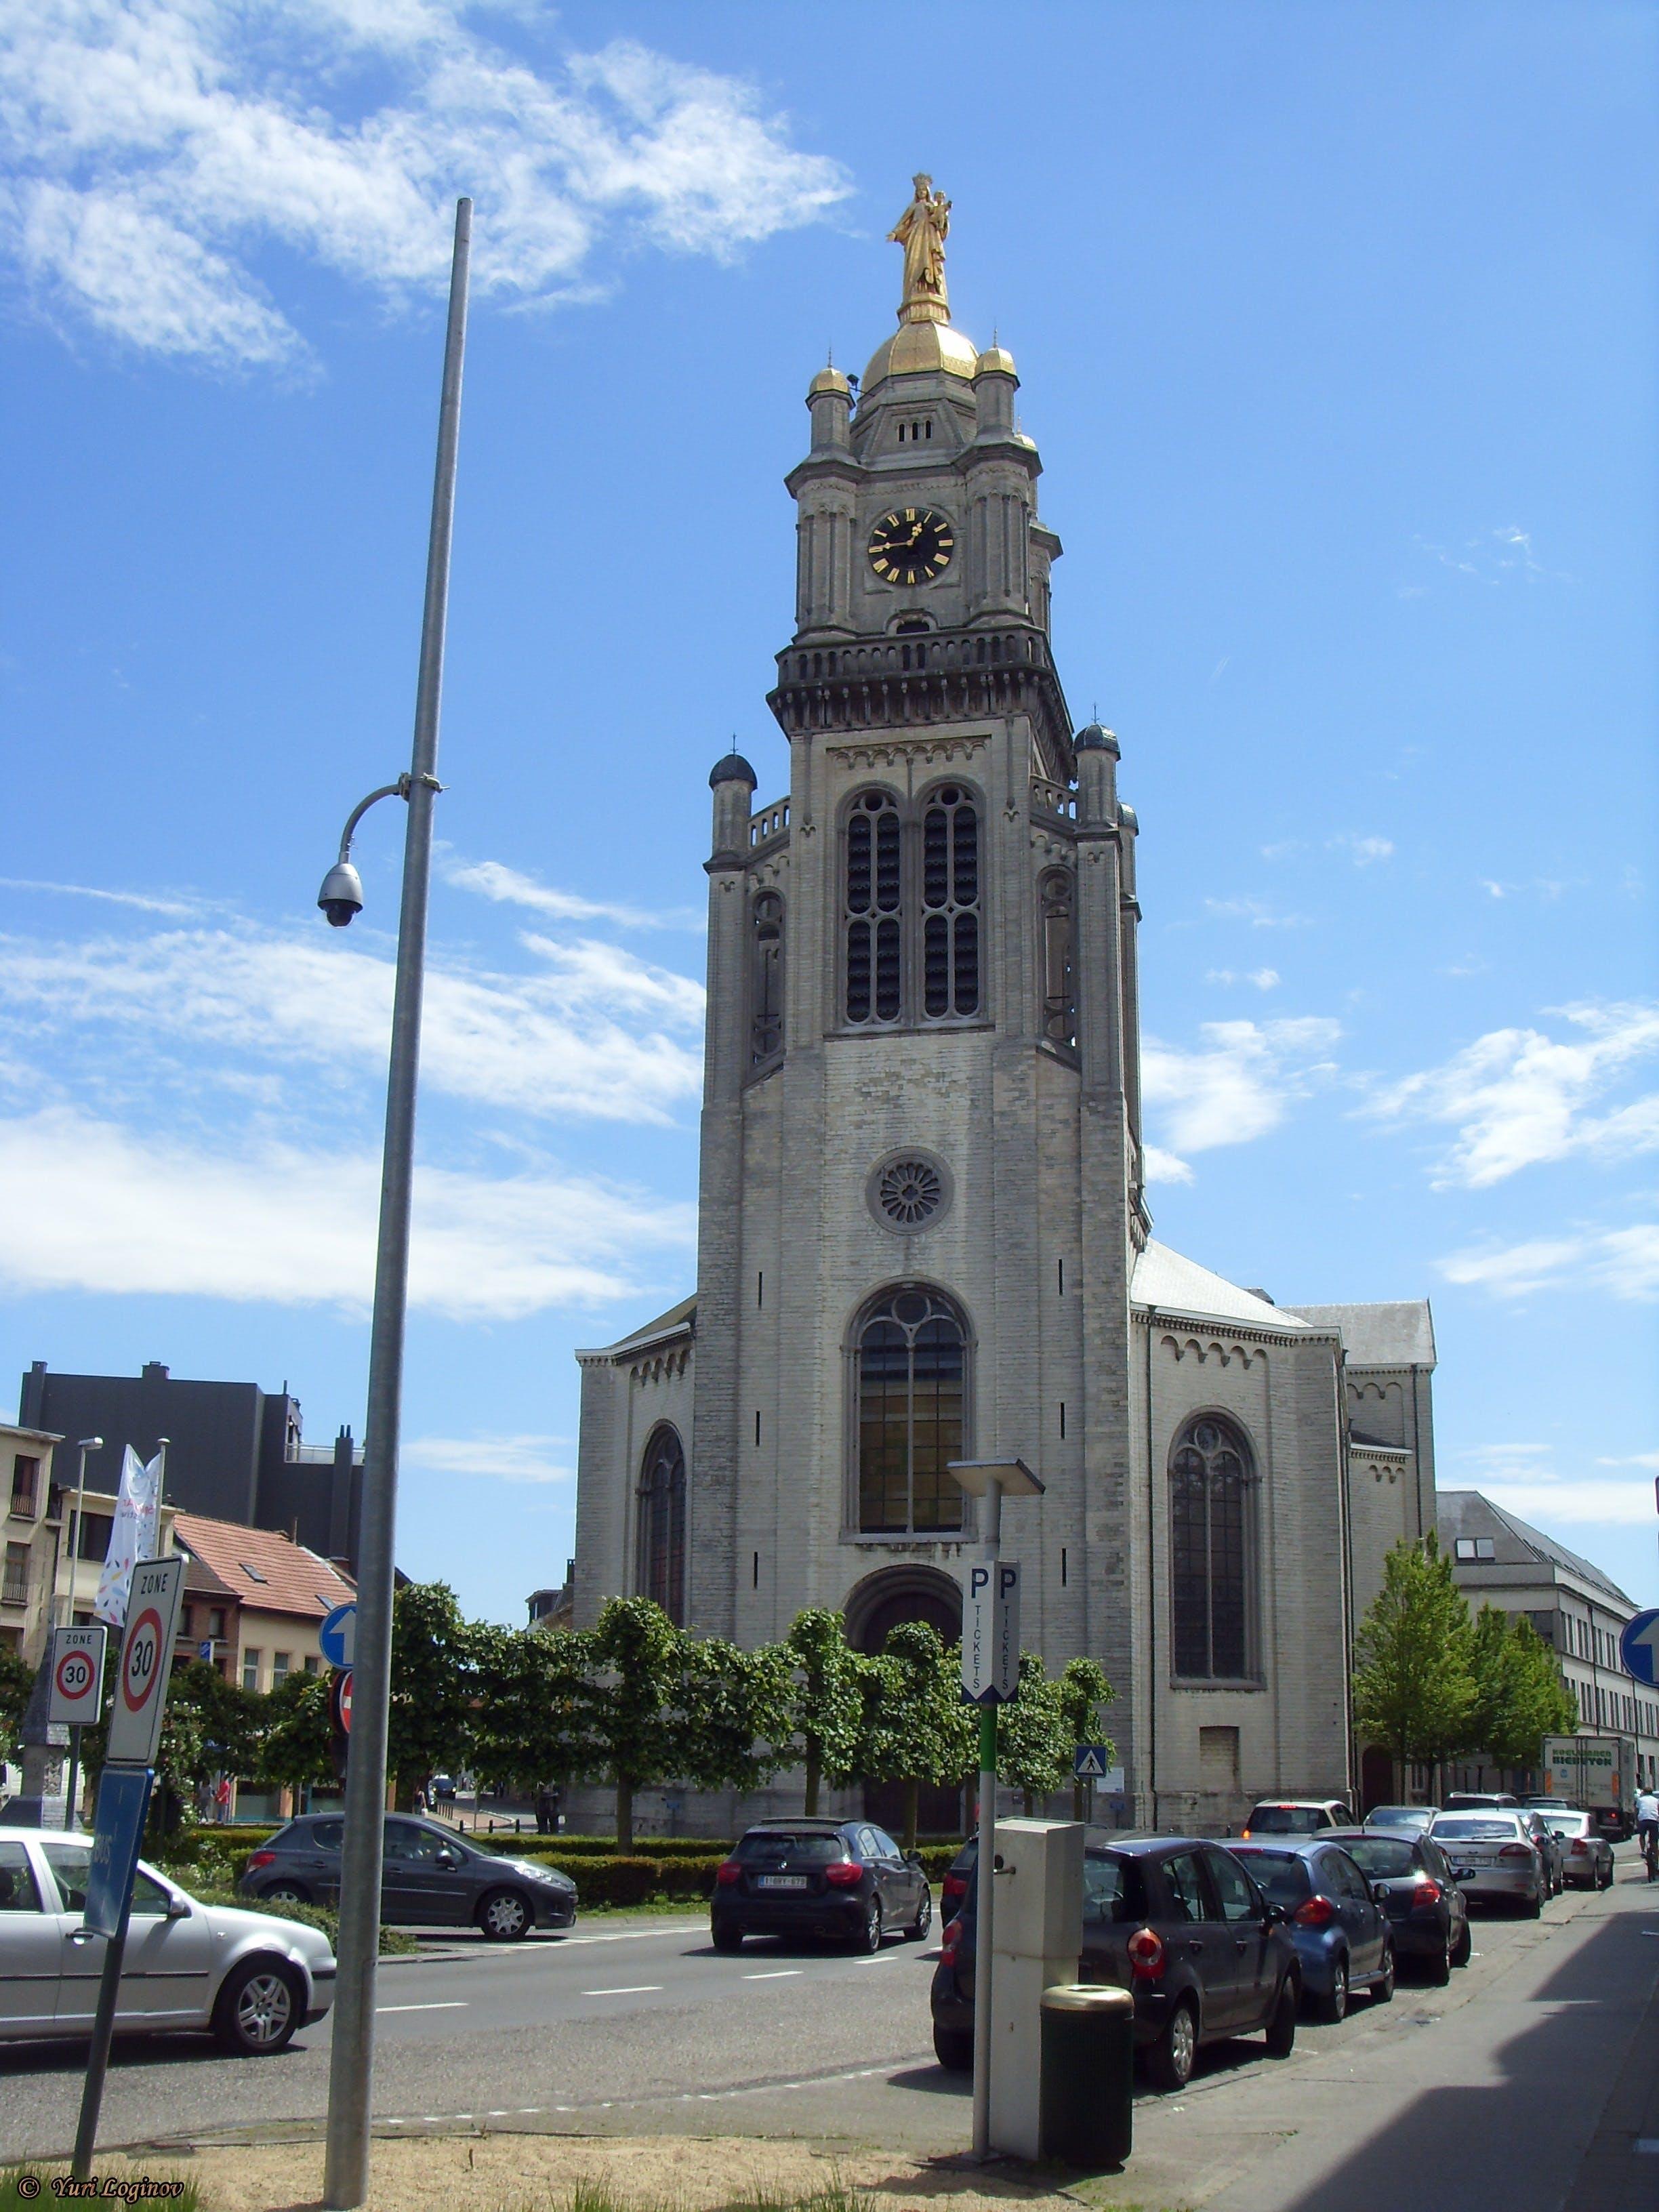 Free stock photo of Belgium, church of our lady, België, Sint-Niklaas